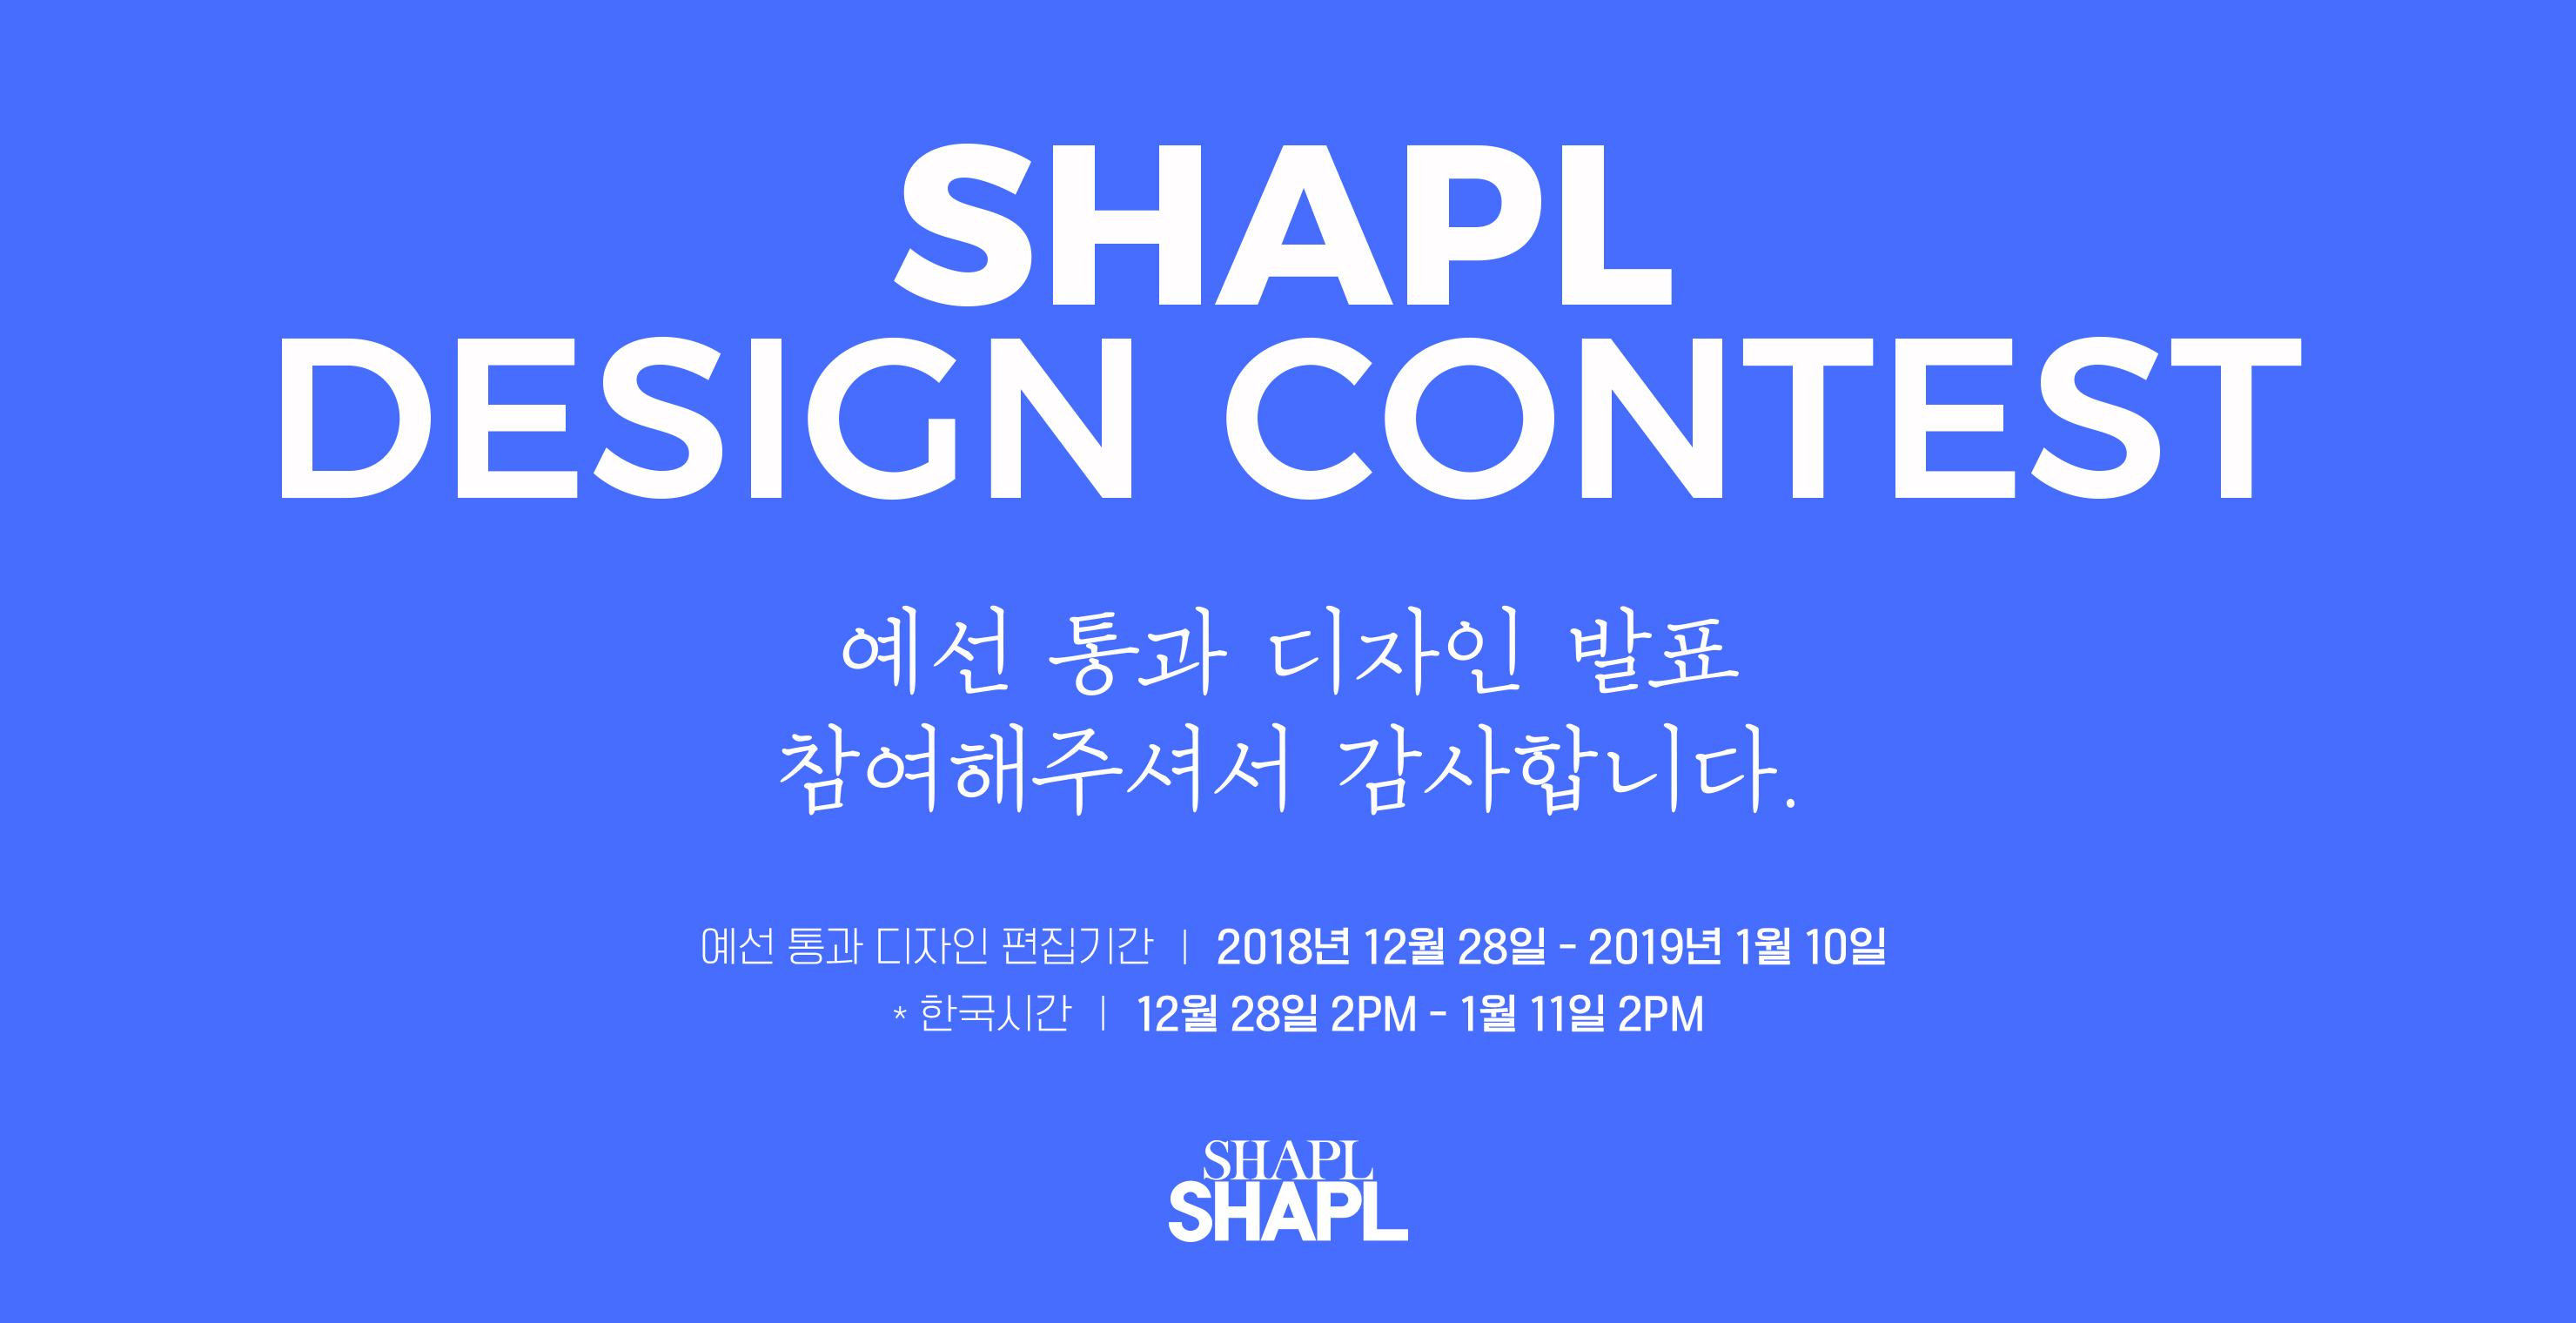 [ SHAPL DESIGN CONTEST ] 예선 통과 디자인 발표